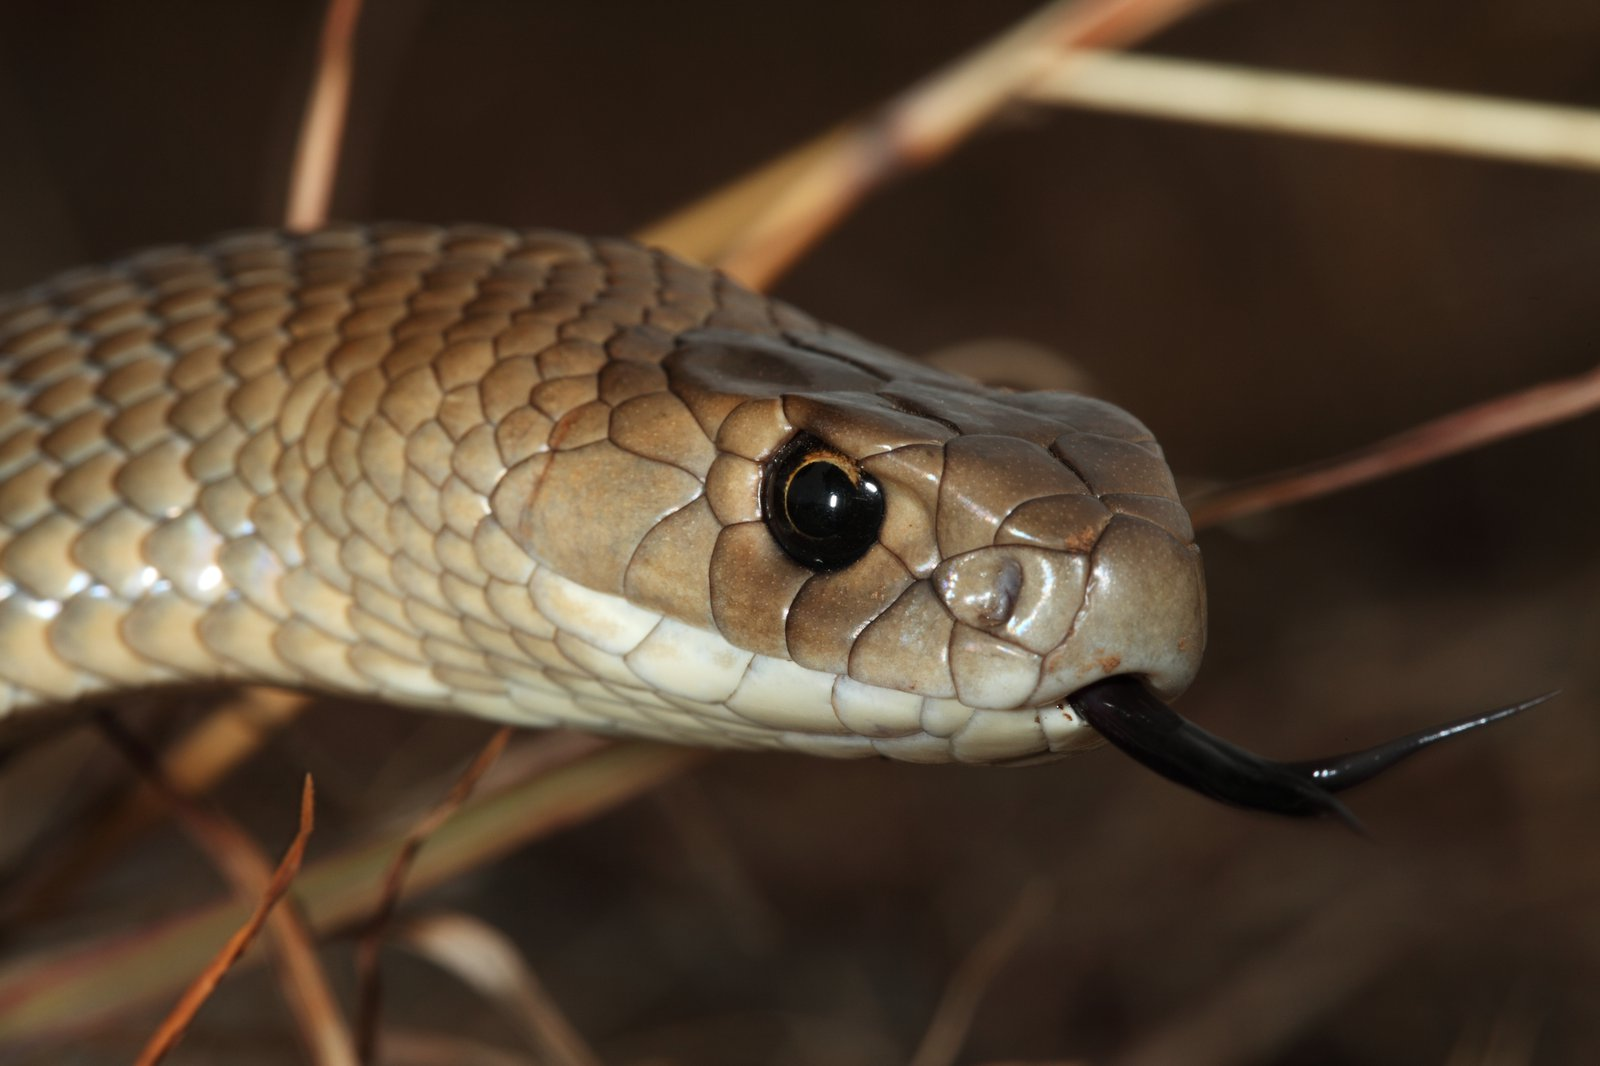 eastern brown snake the australian museum viper diagram snake muscular diagram wiring diagram